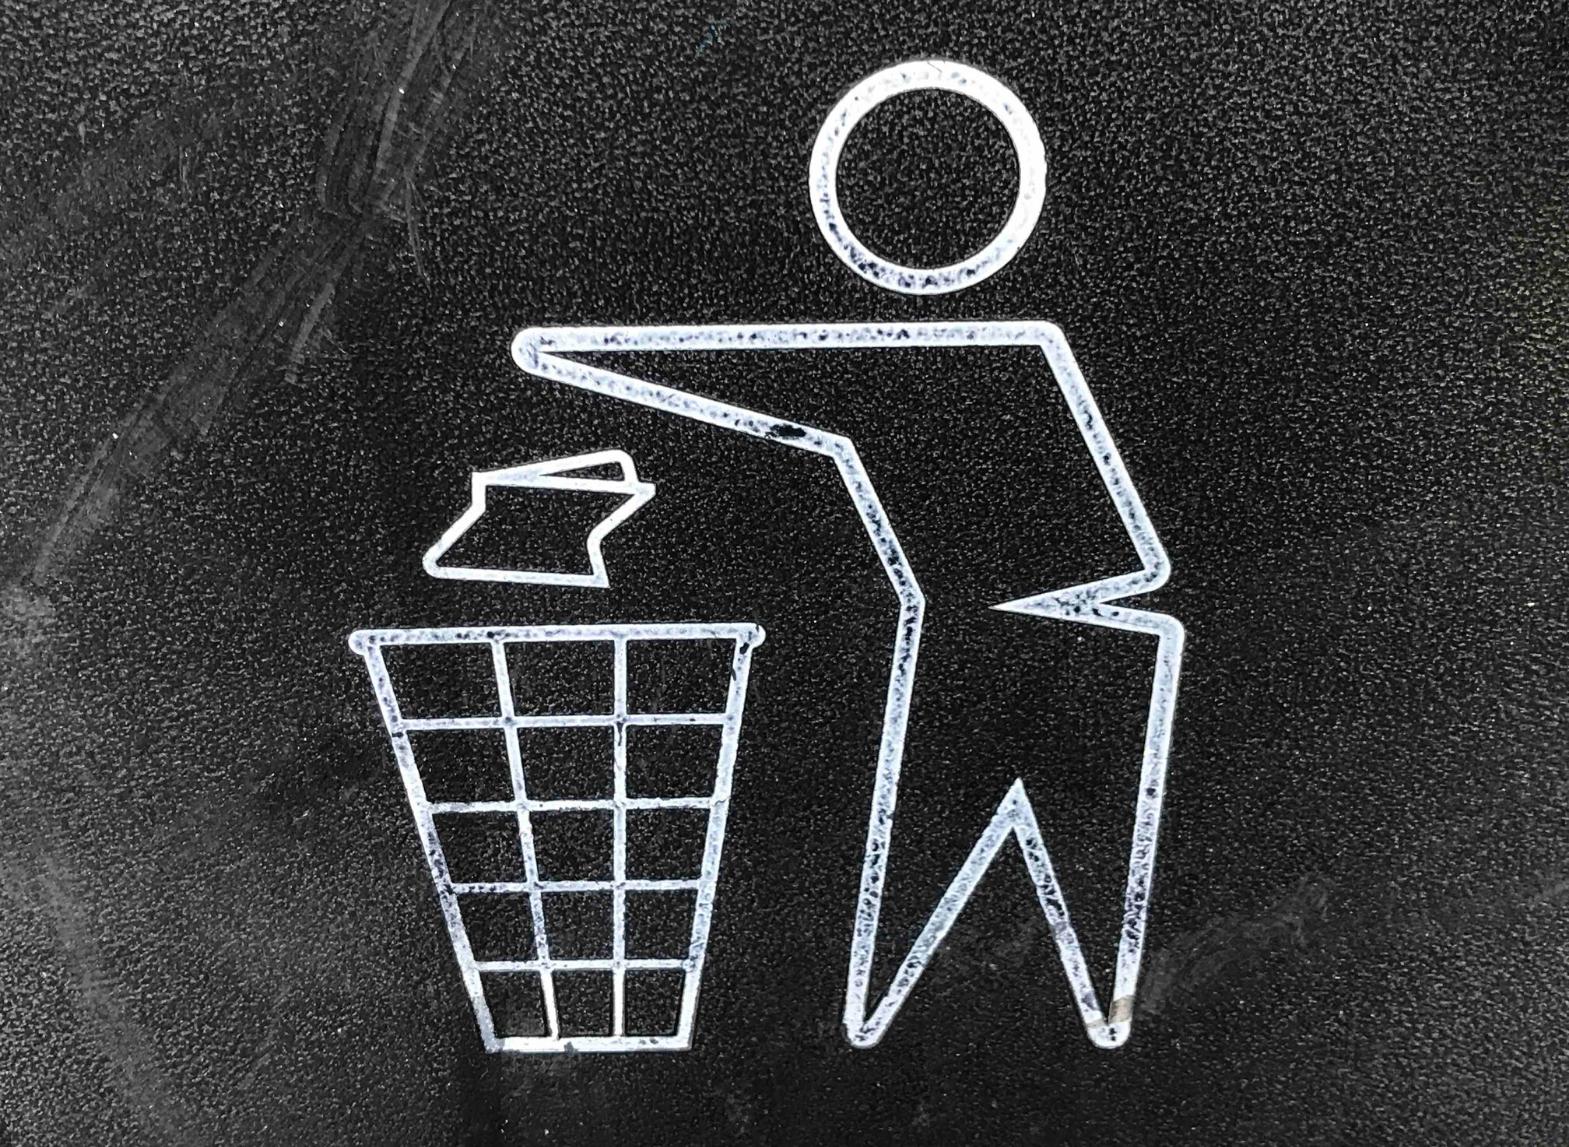 Hubspot crm system_clean clutter